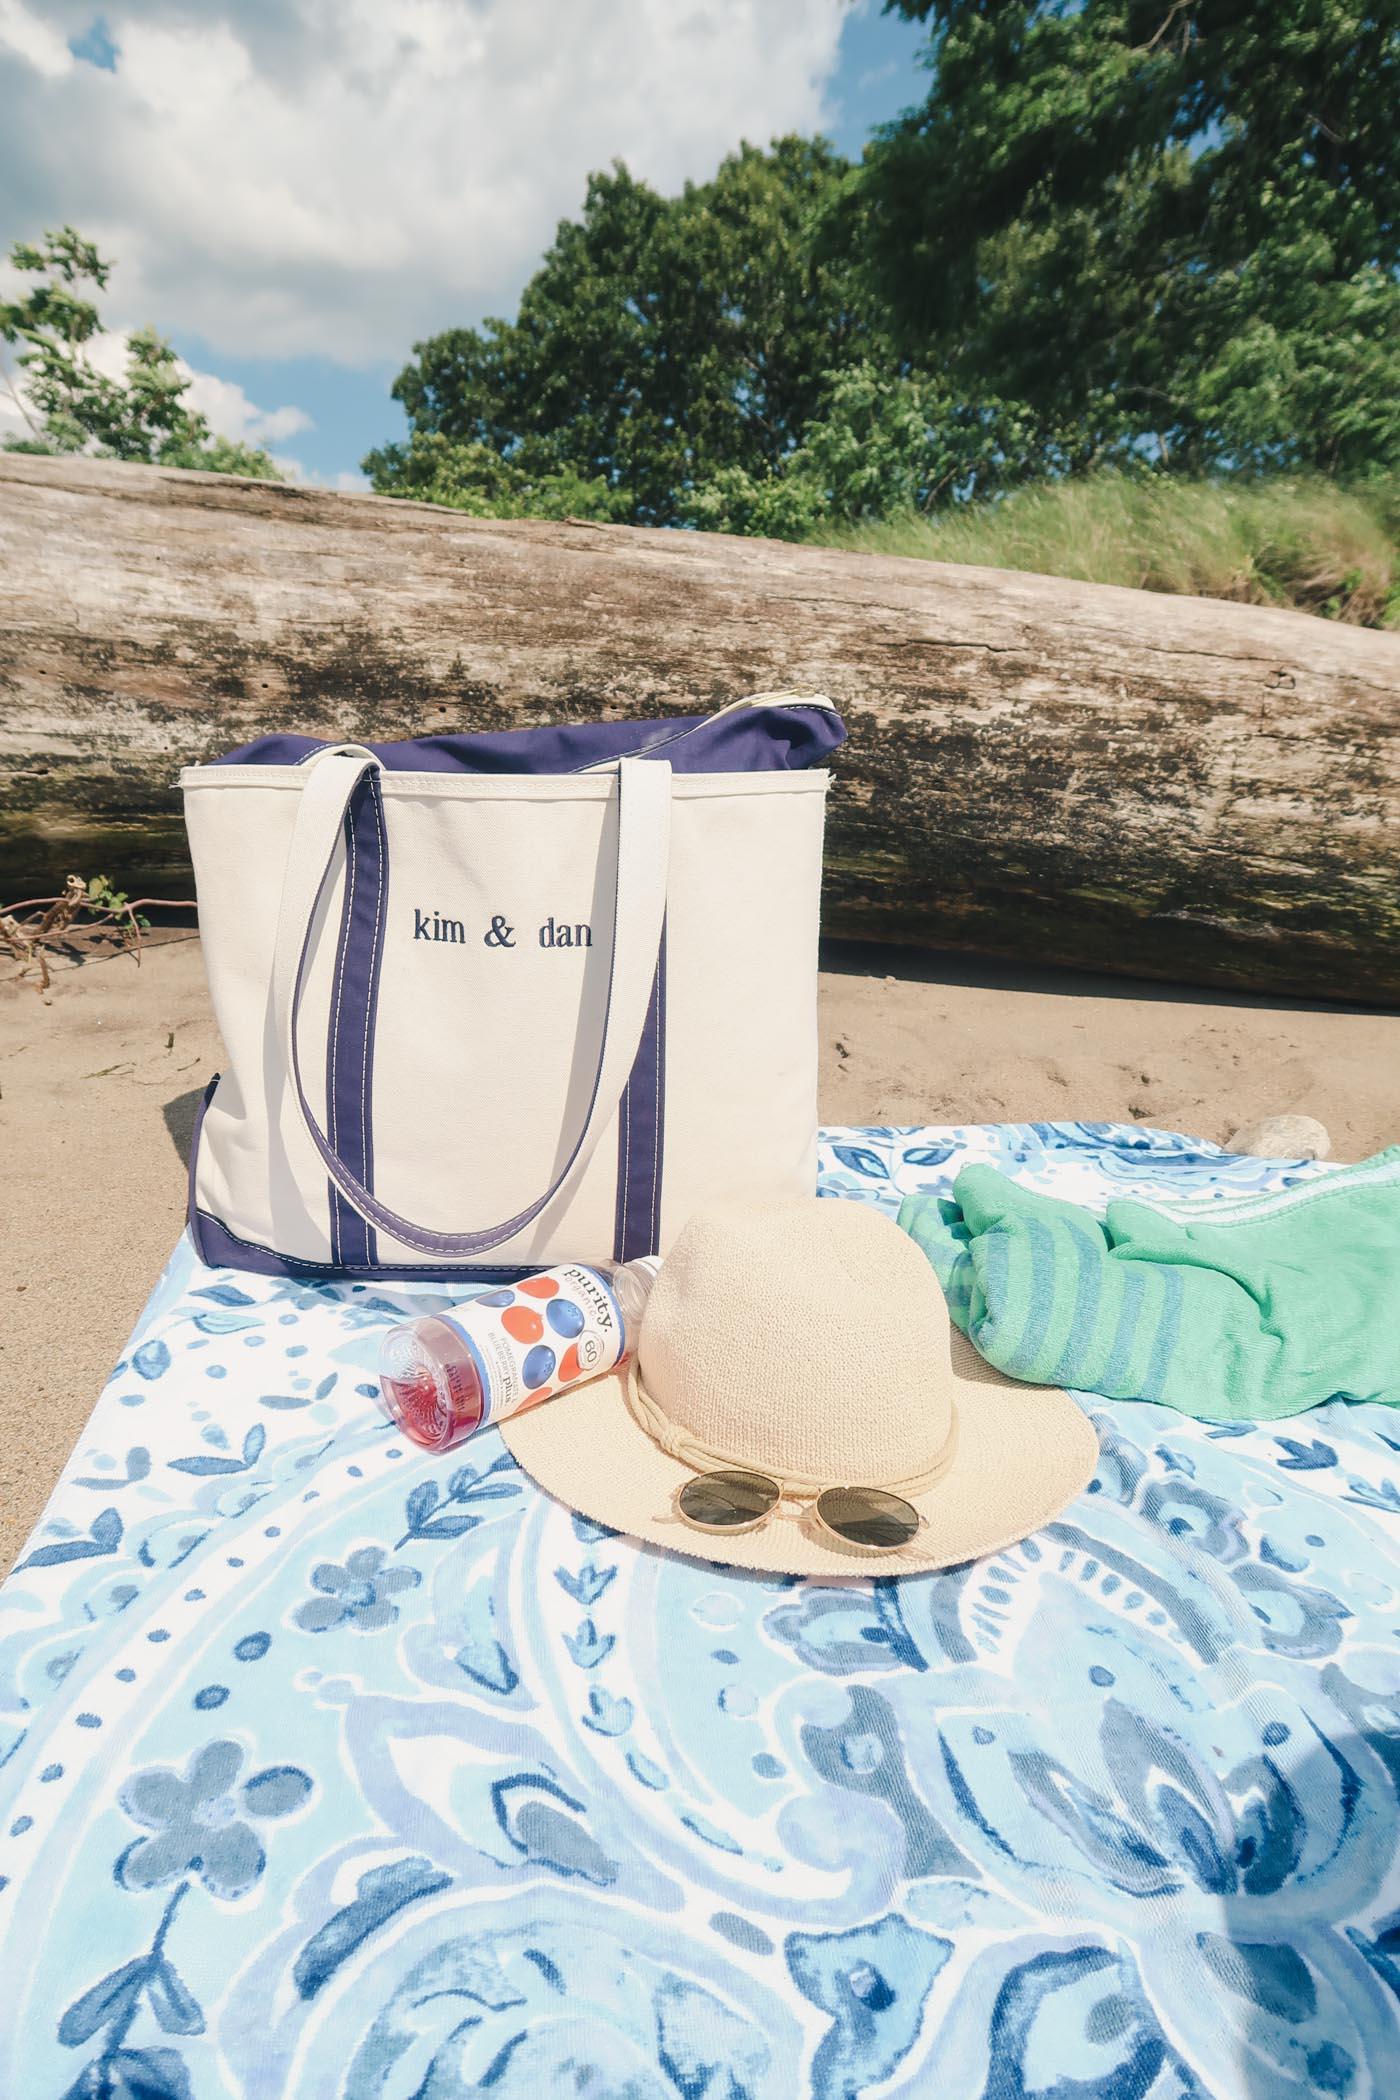 LLBean Beach bag, hat, and towel